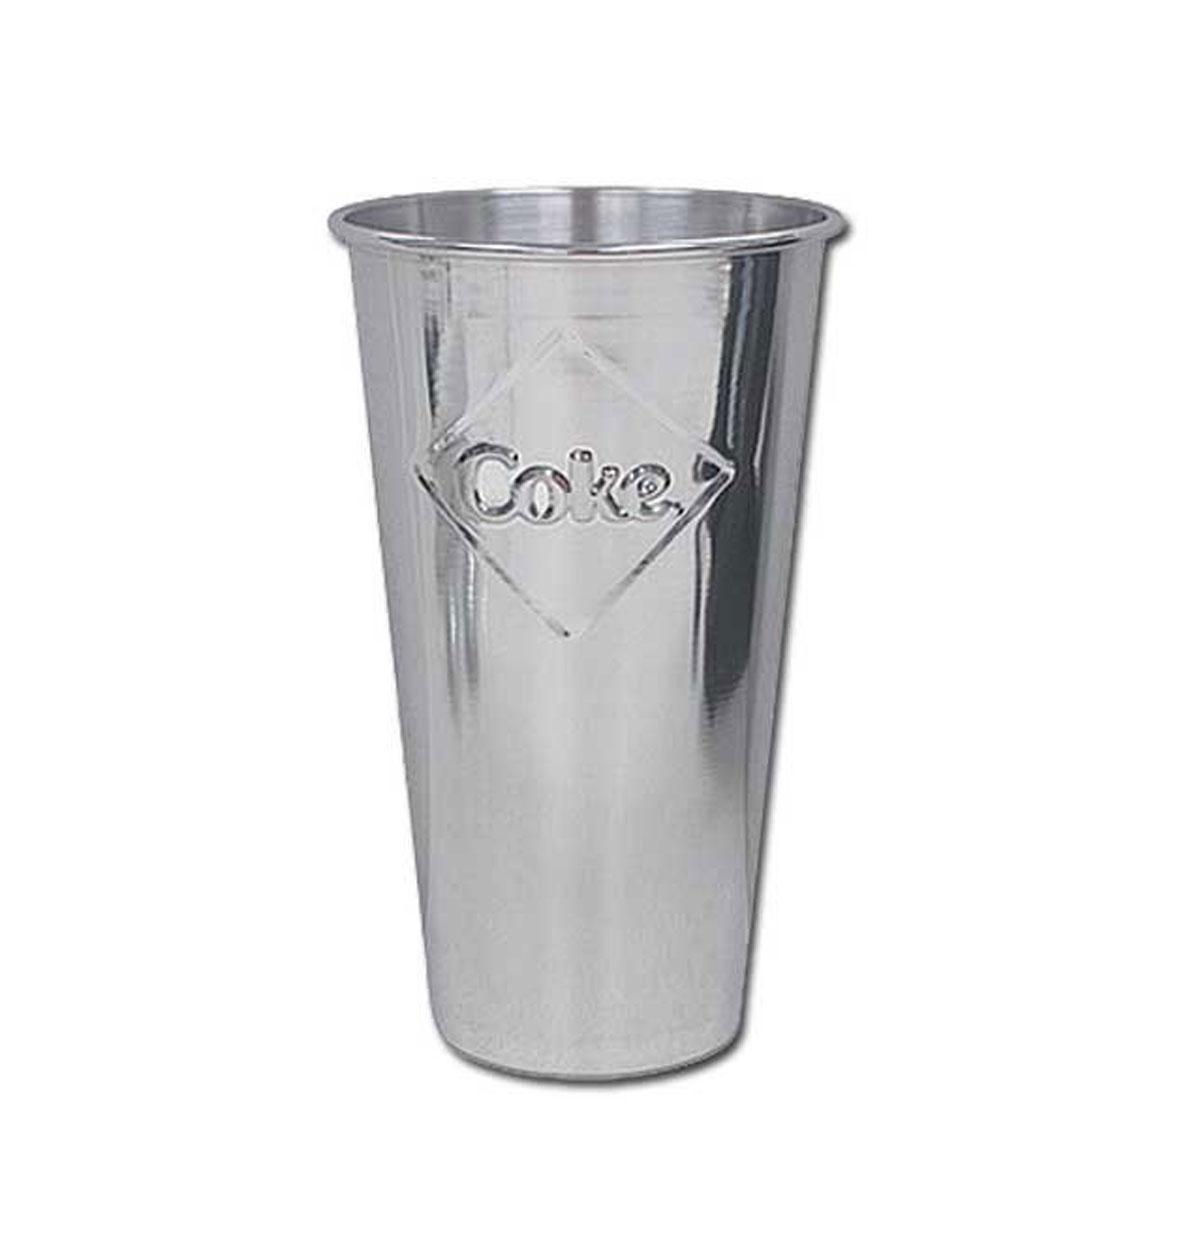 Coca-Cola Coke Malt Cup (milkshake)